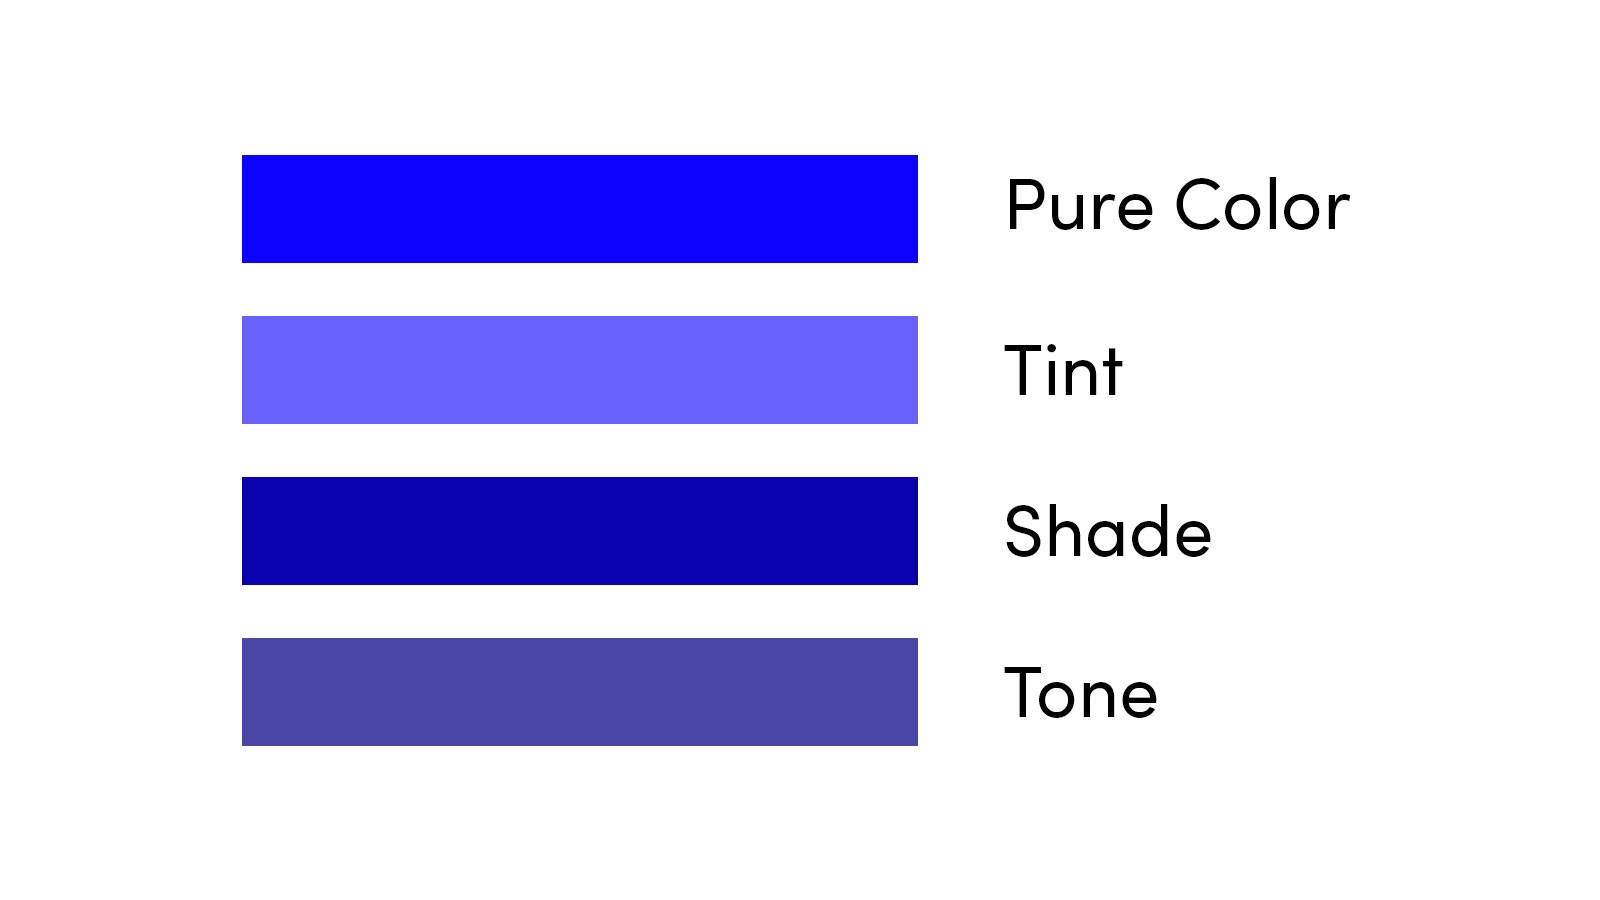 Visualization comparing tint vs shade vs tone